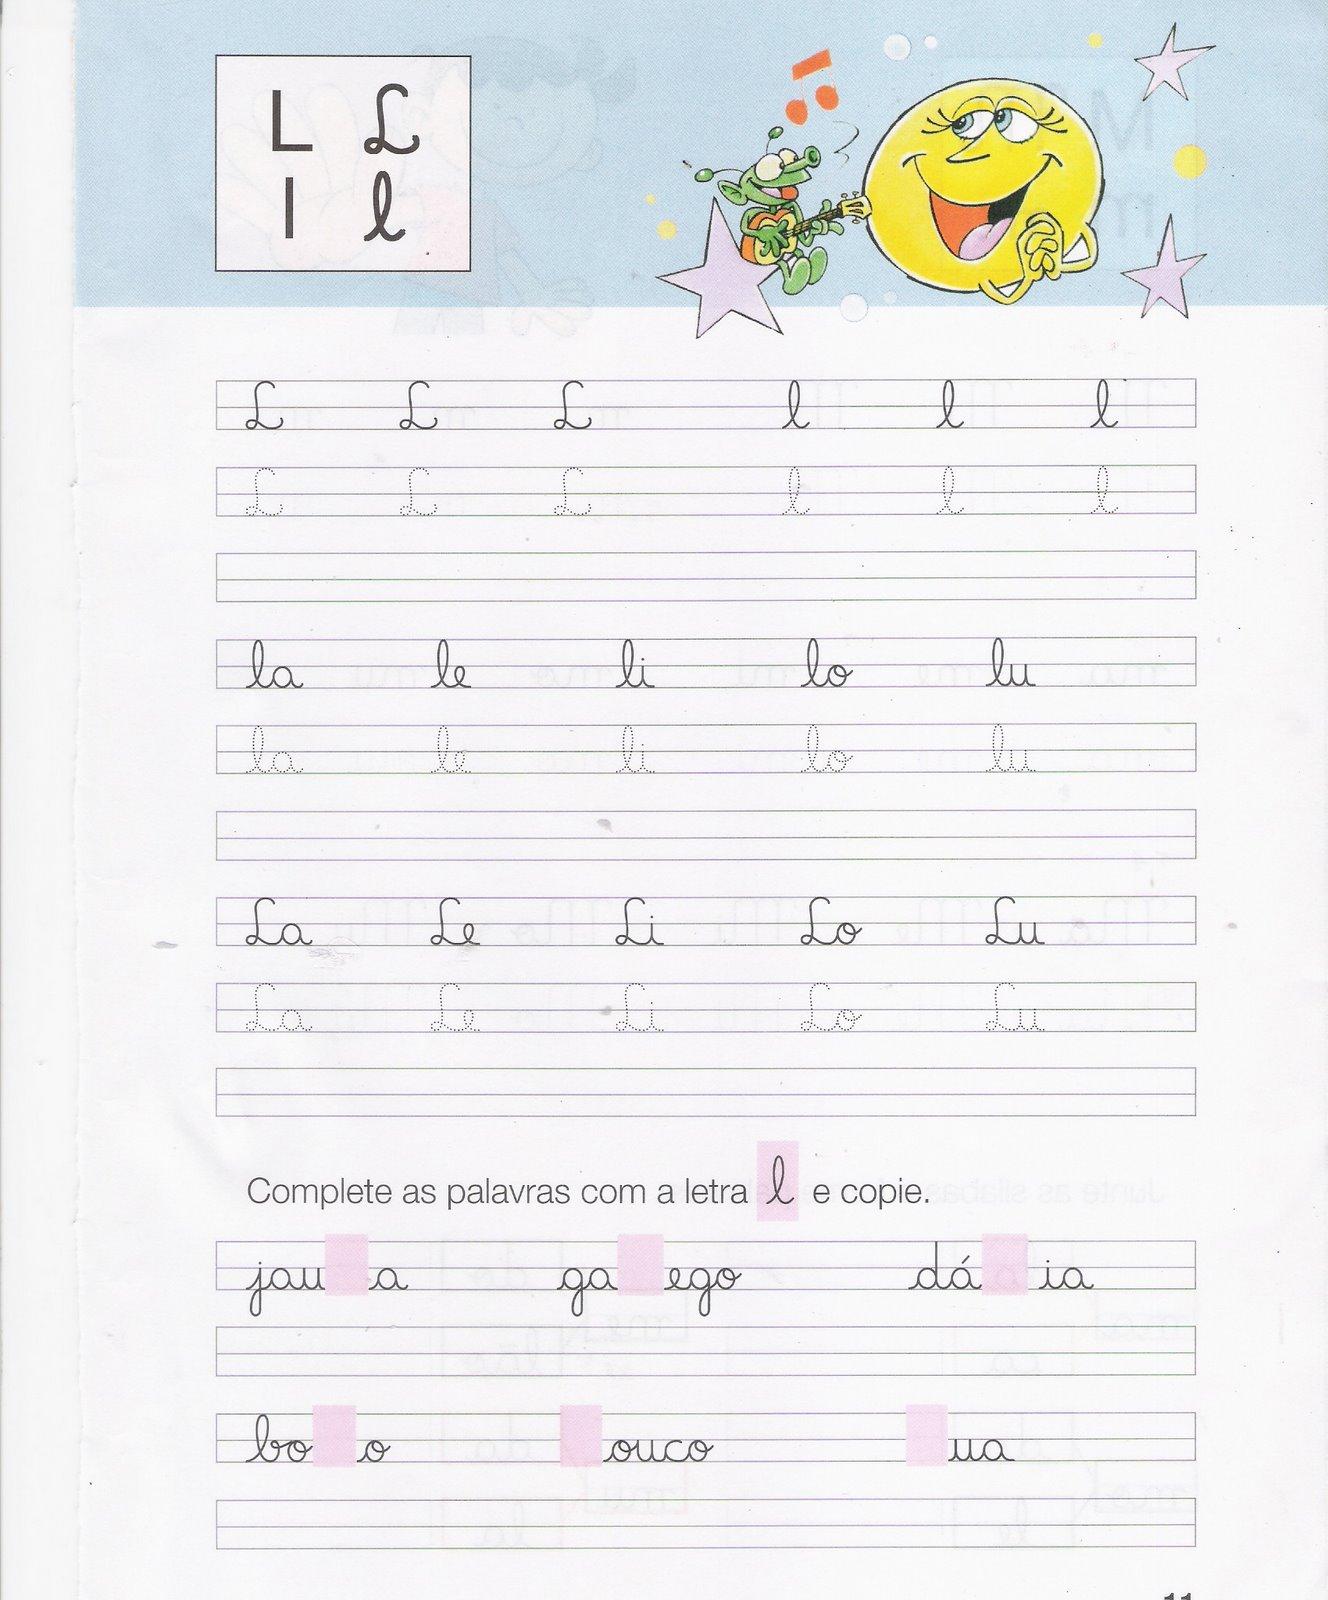 Fichas de caligrafia: Letras L, M, N, P, - Atividades Educativas